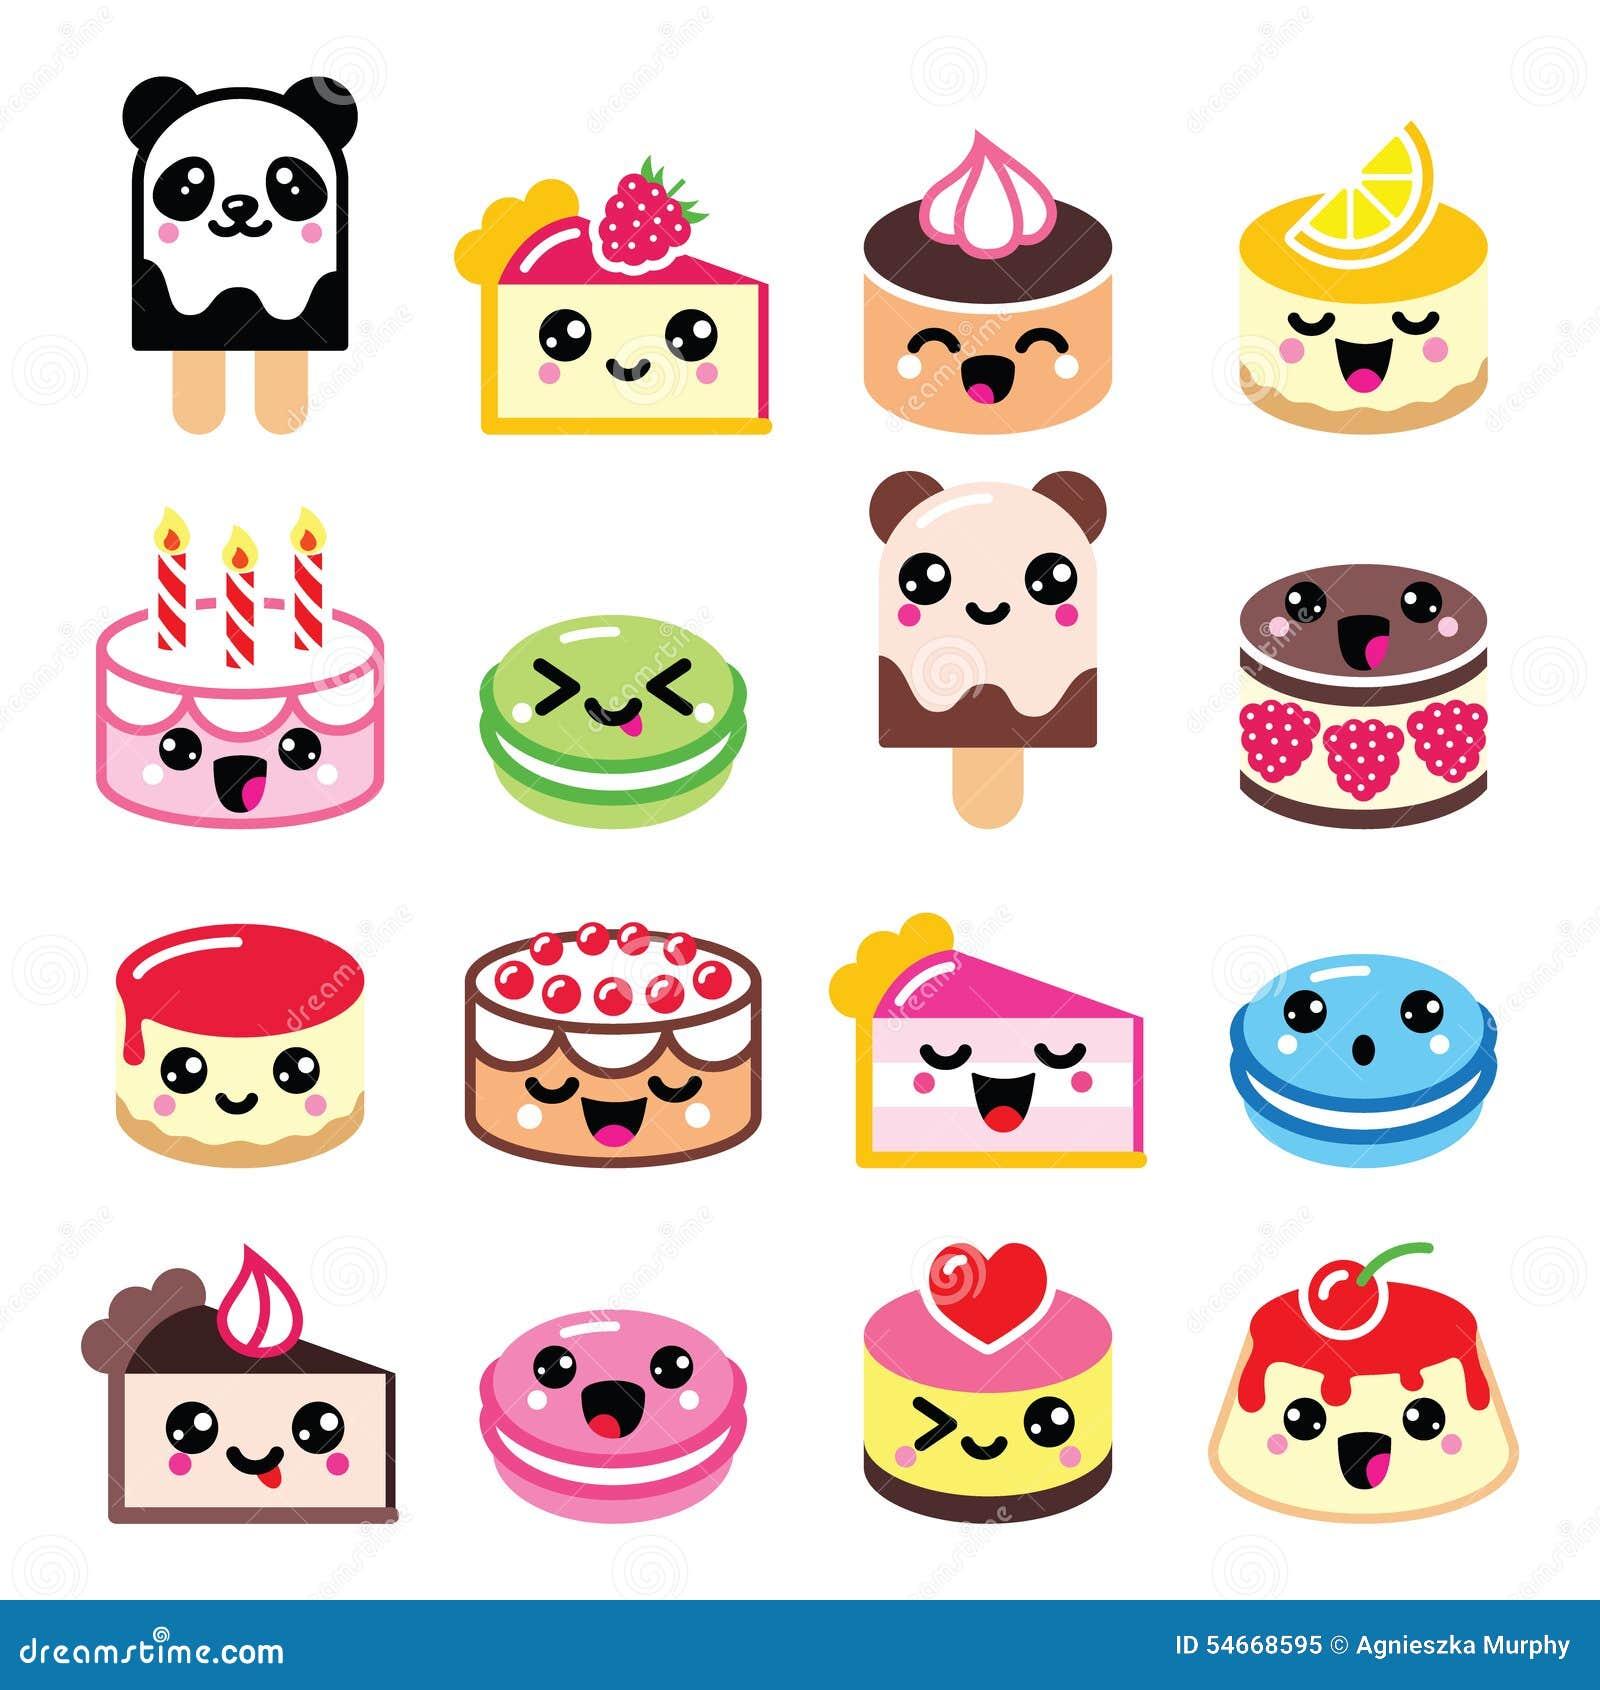 Uncategorized Cute Kawaii Food cute kawaii dessert cake macaroon ice cream icons stock food isolated kawaii